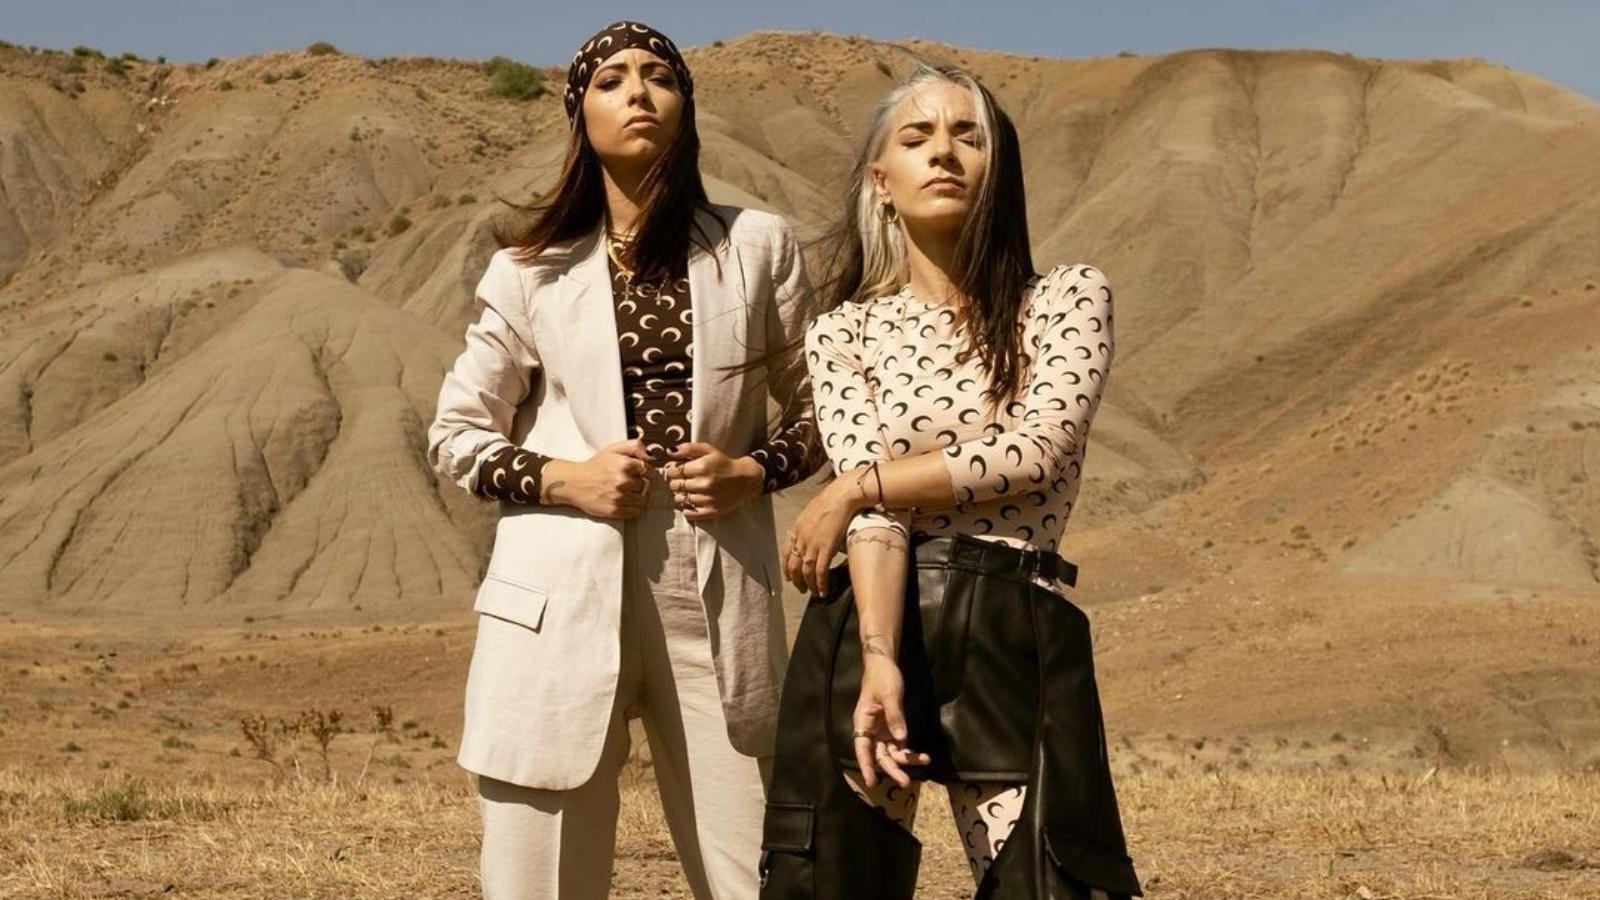 Gioli & Assia: Το λεσβιακό ντουέτο της electro pop σκηνής